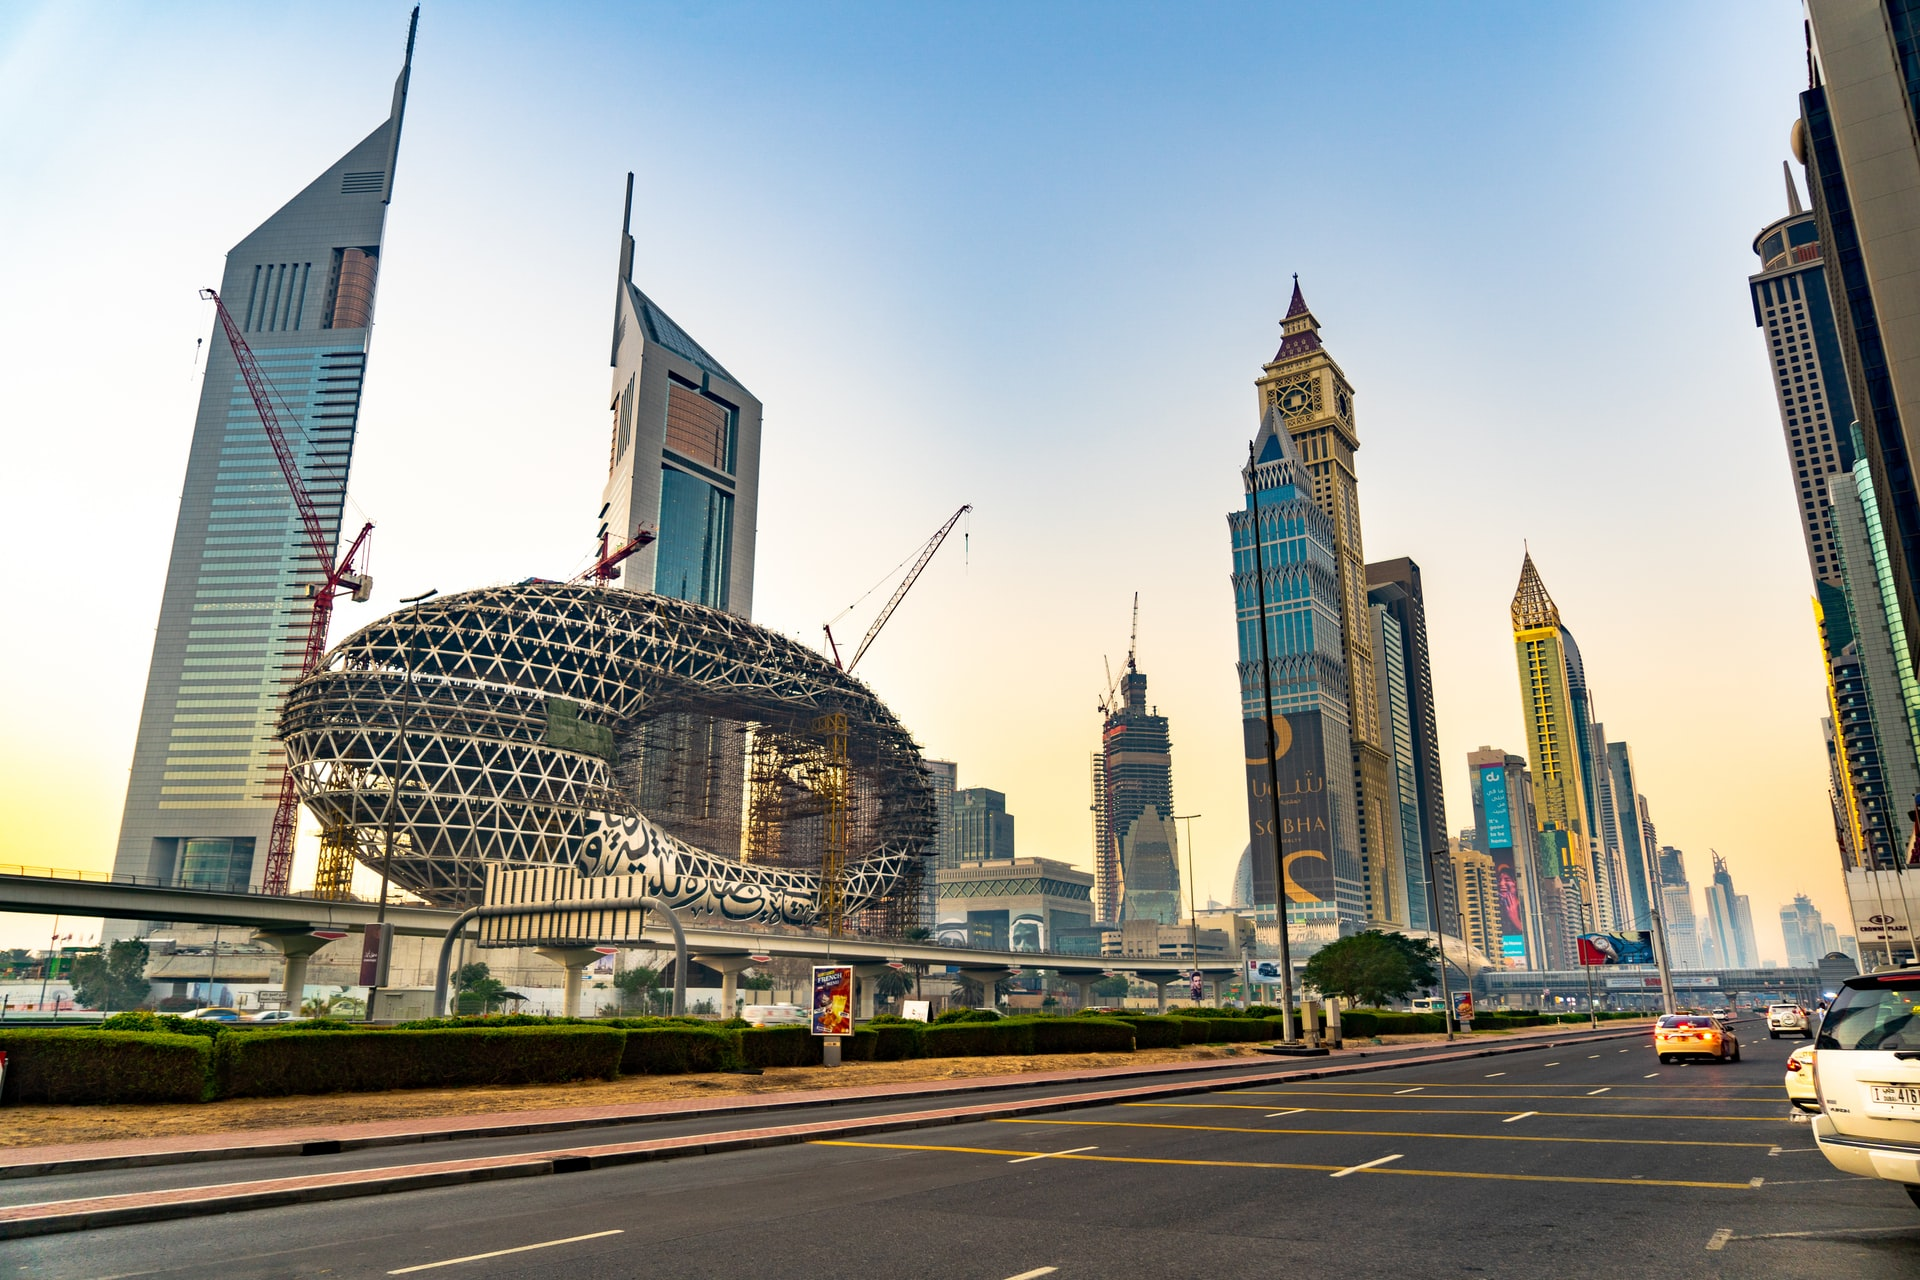 jumeirah-emirates-towers-dubai-green-country-travel